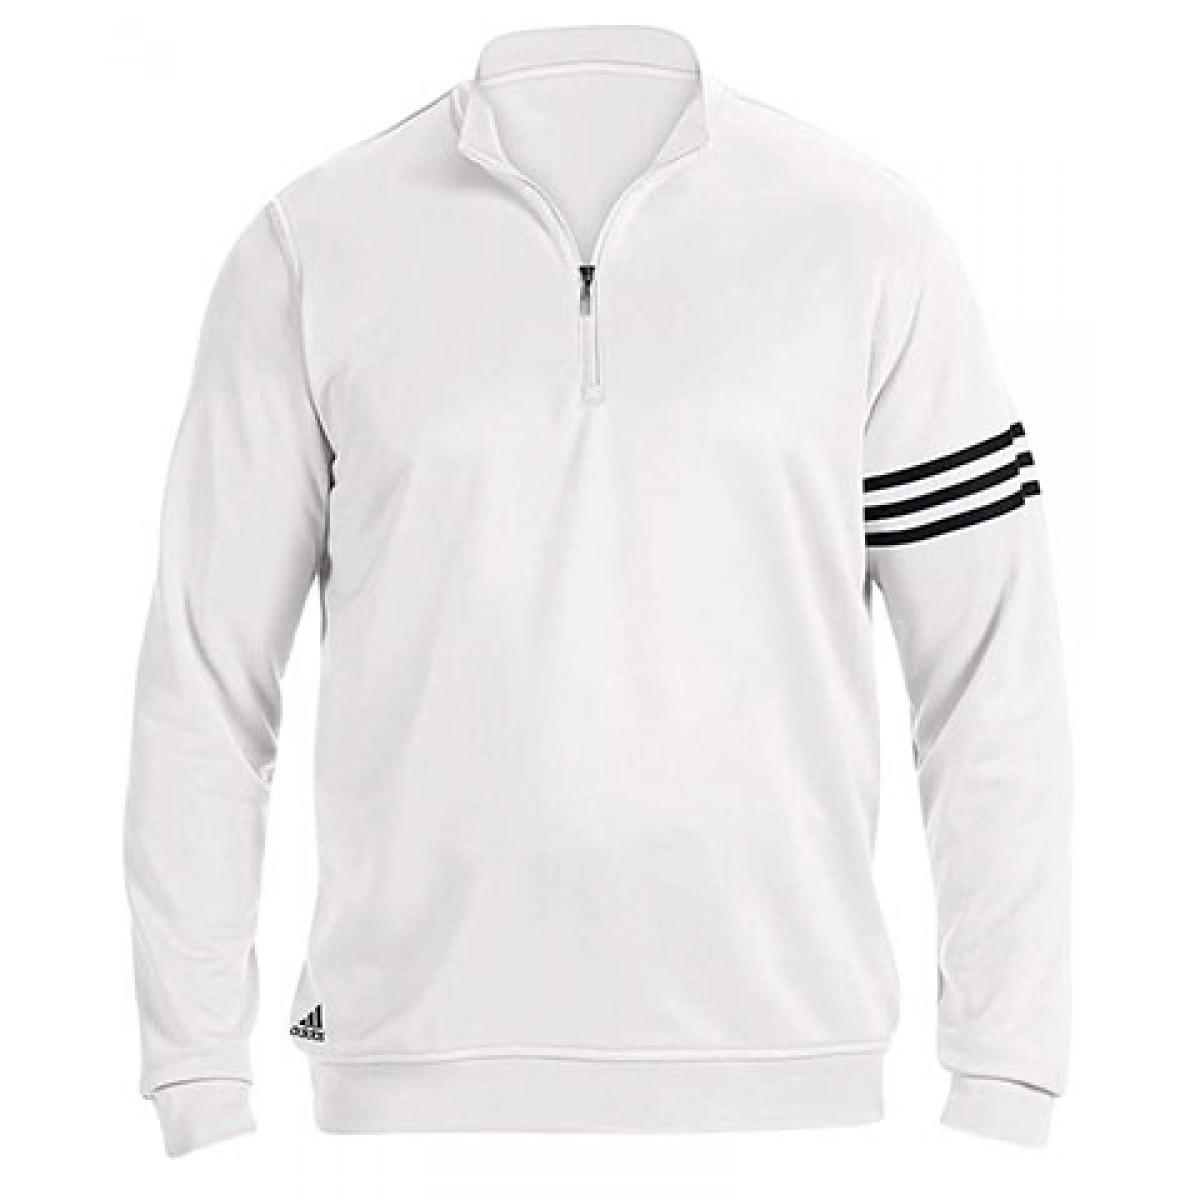 Adidas Men's 3-Stripes Pullover